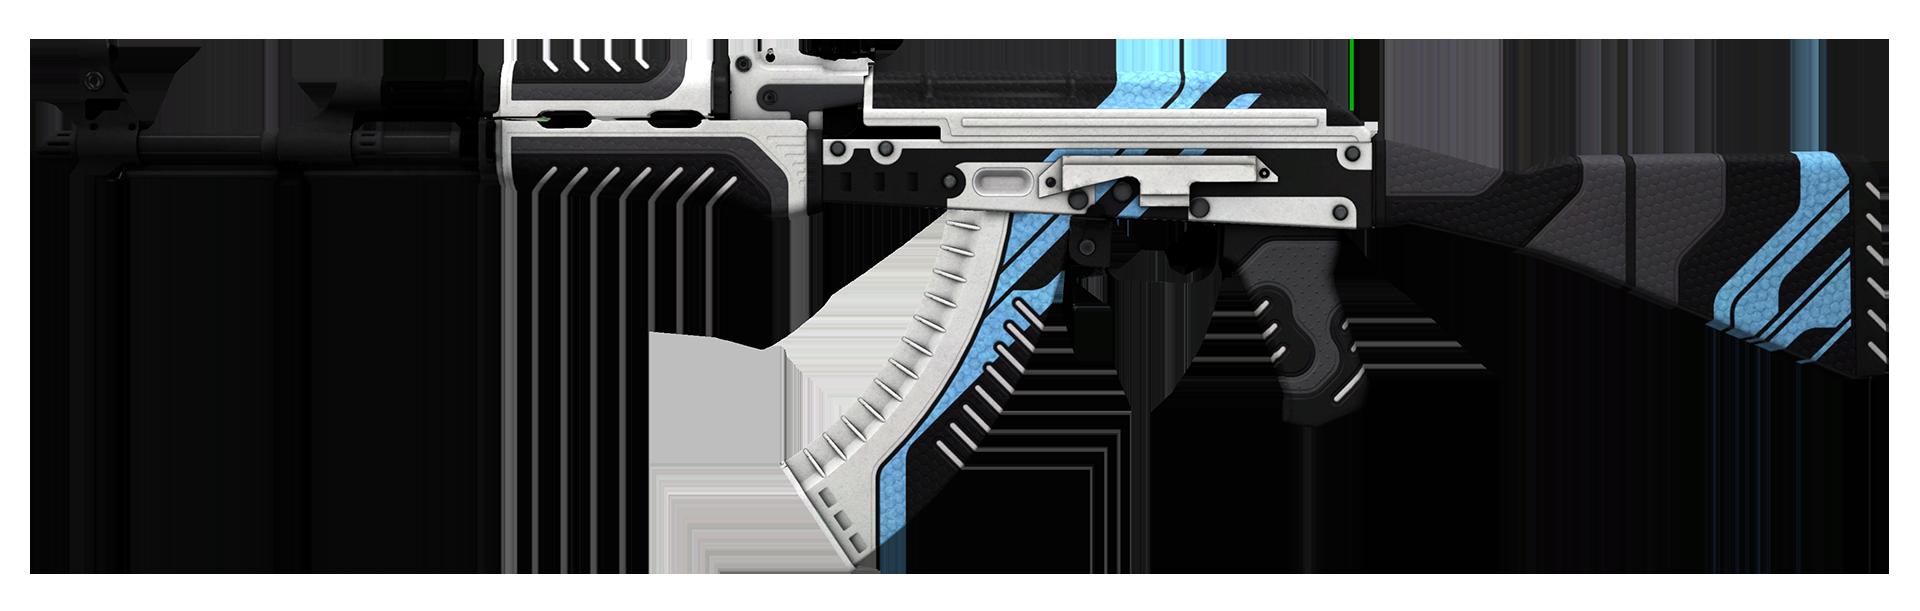 AK-47 Vulcan Large Rendering